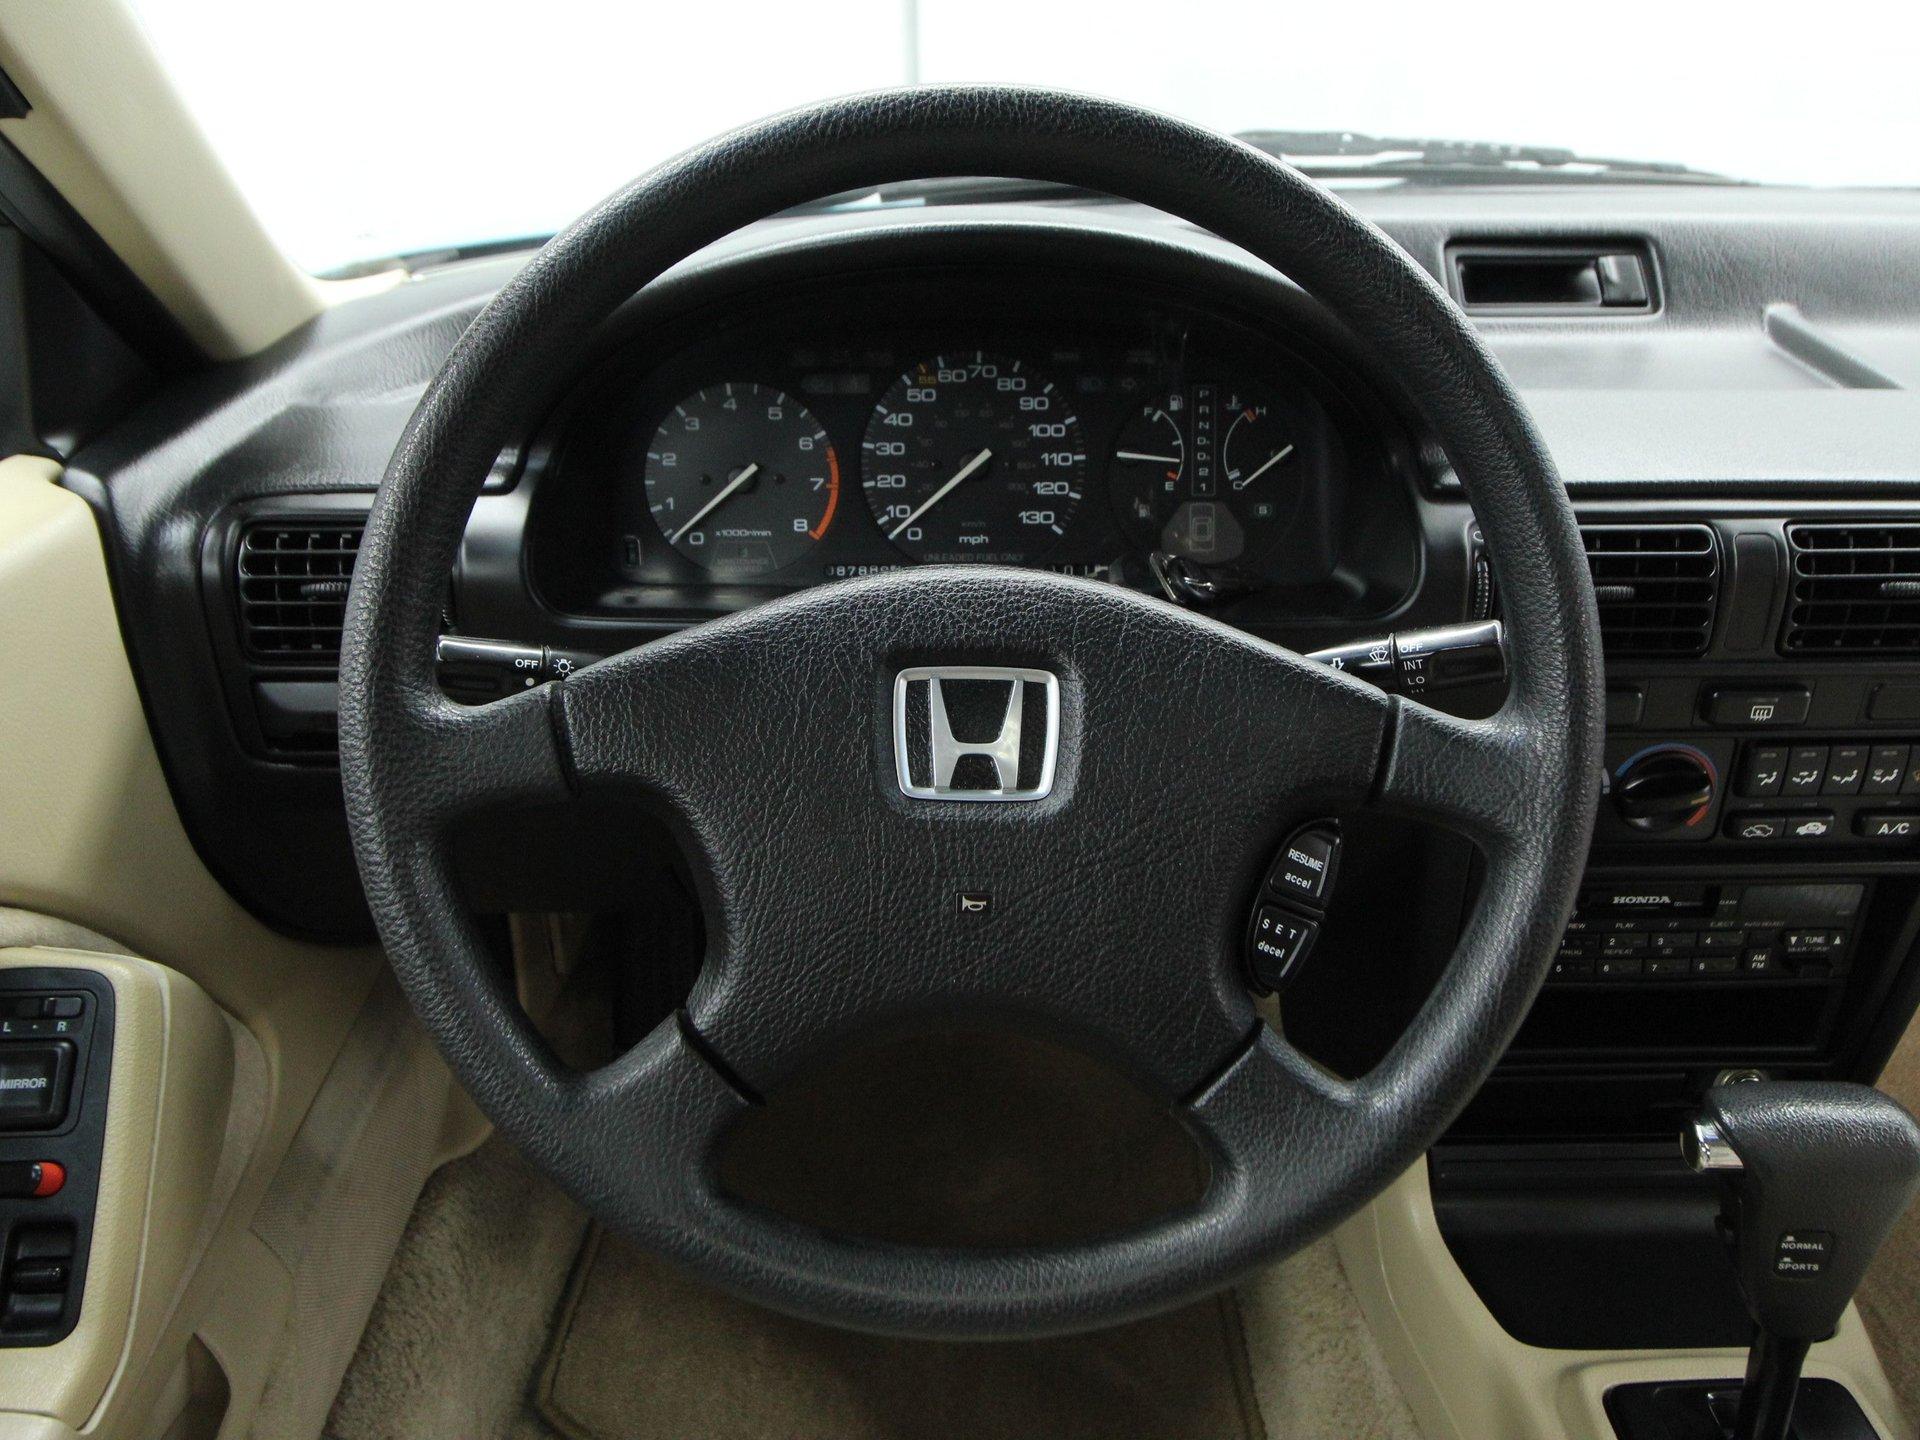 1991 Honda Accord